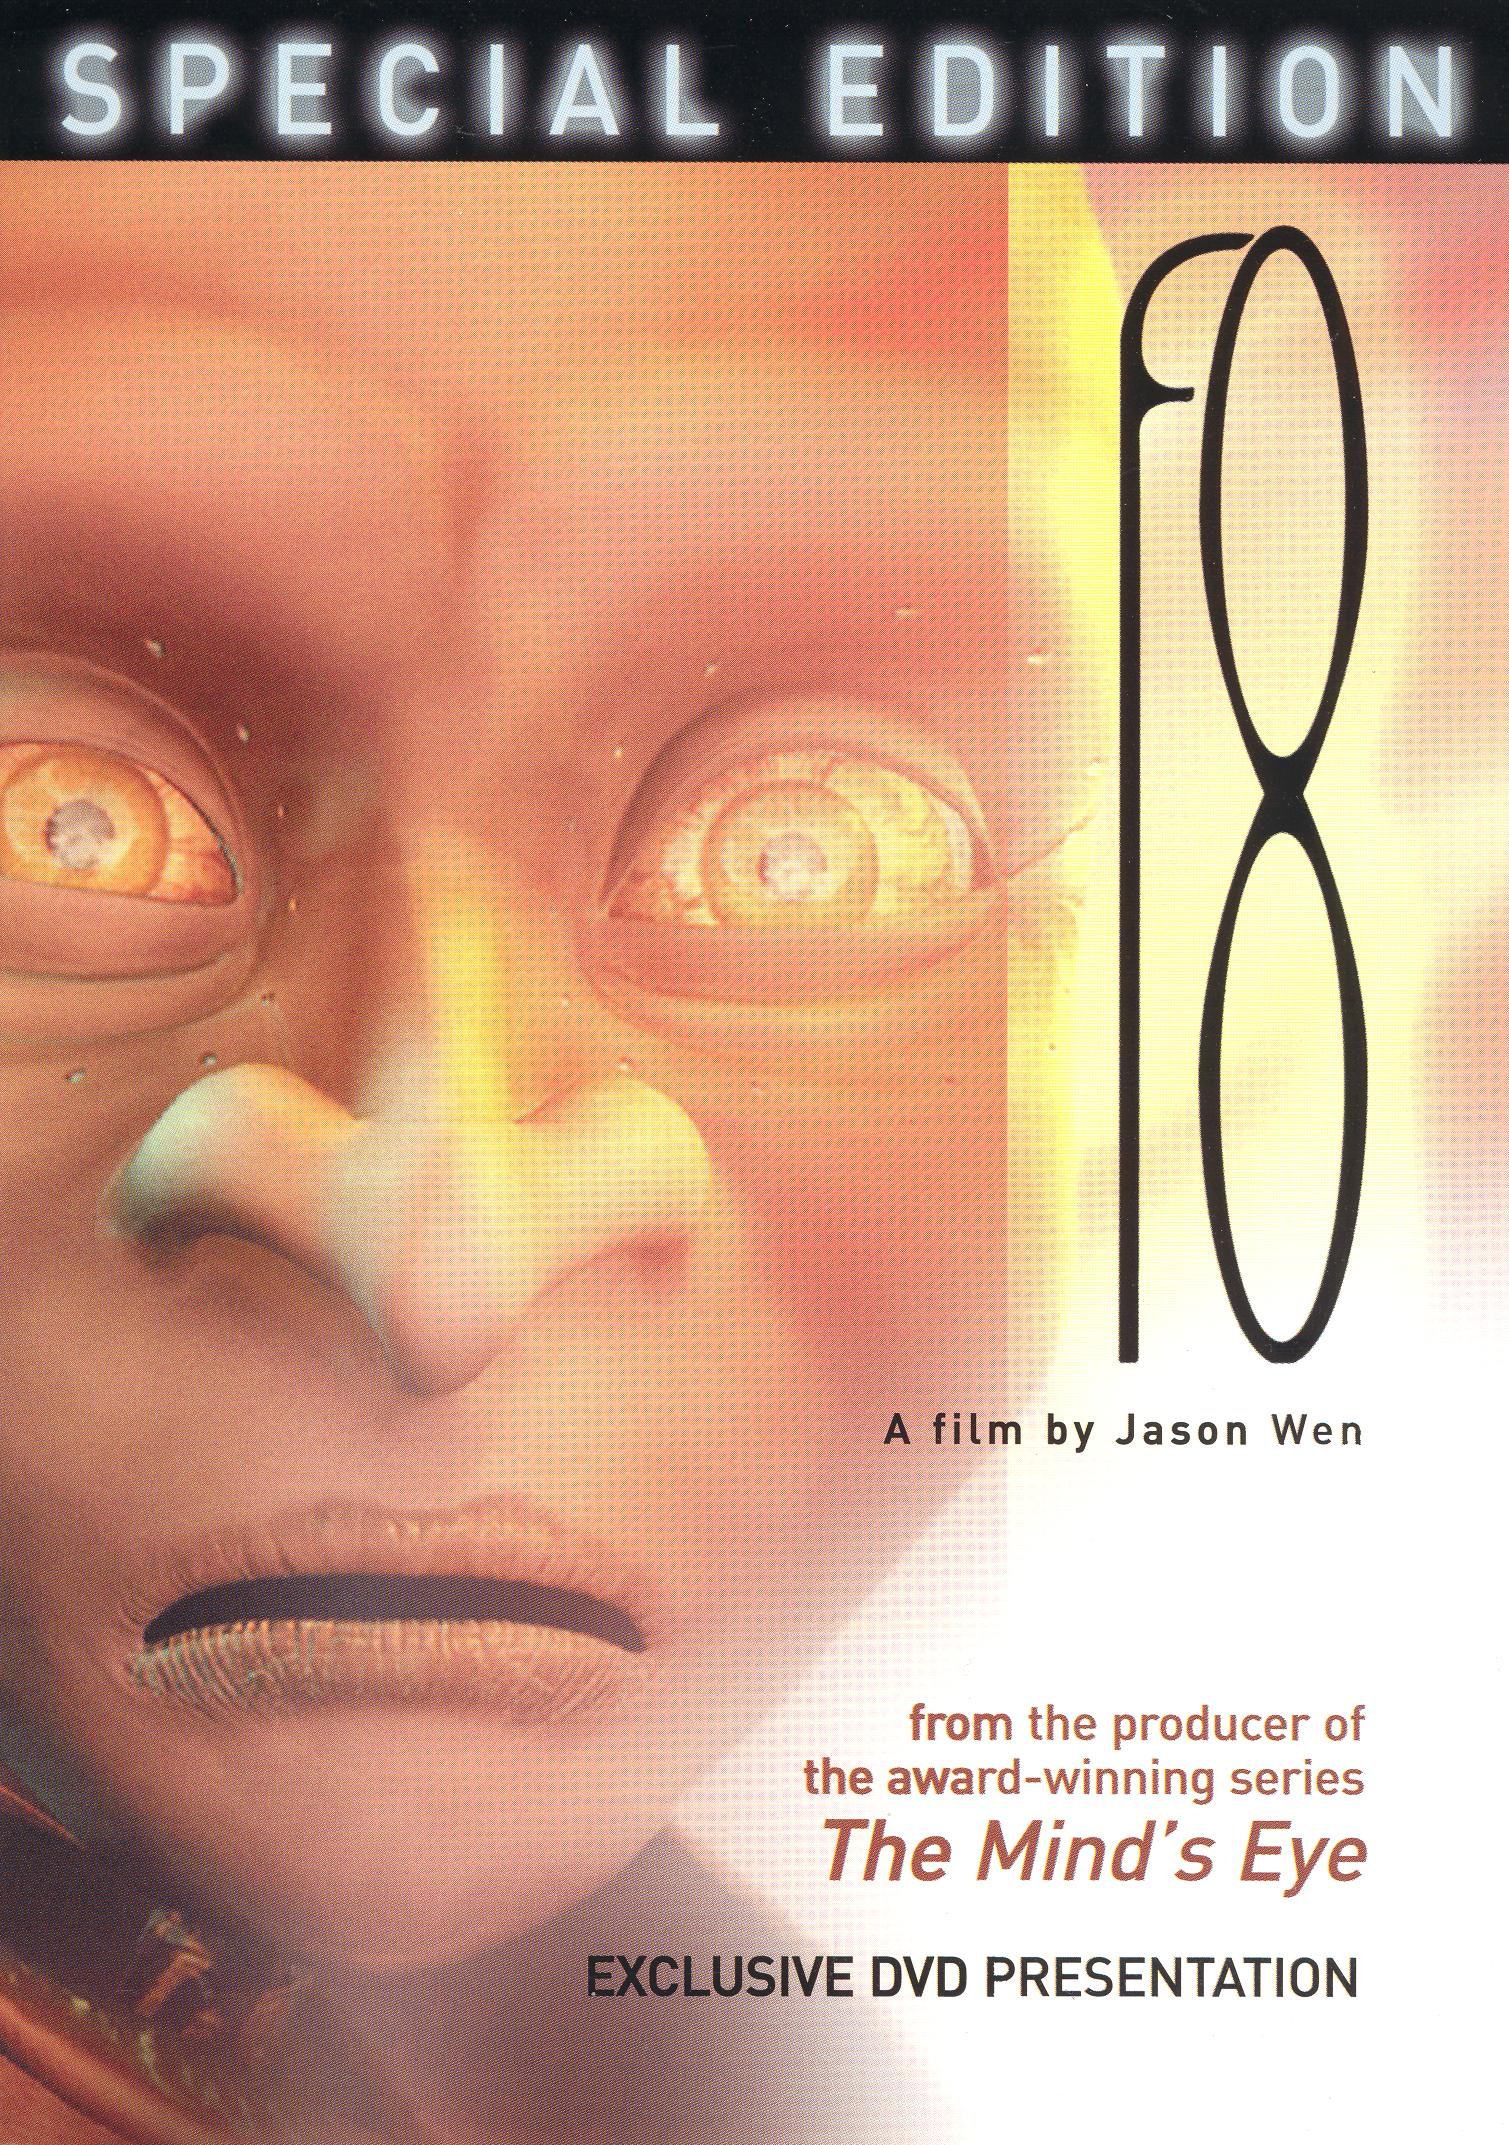 F8 (2001)